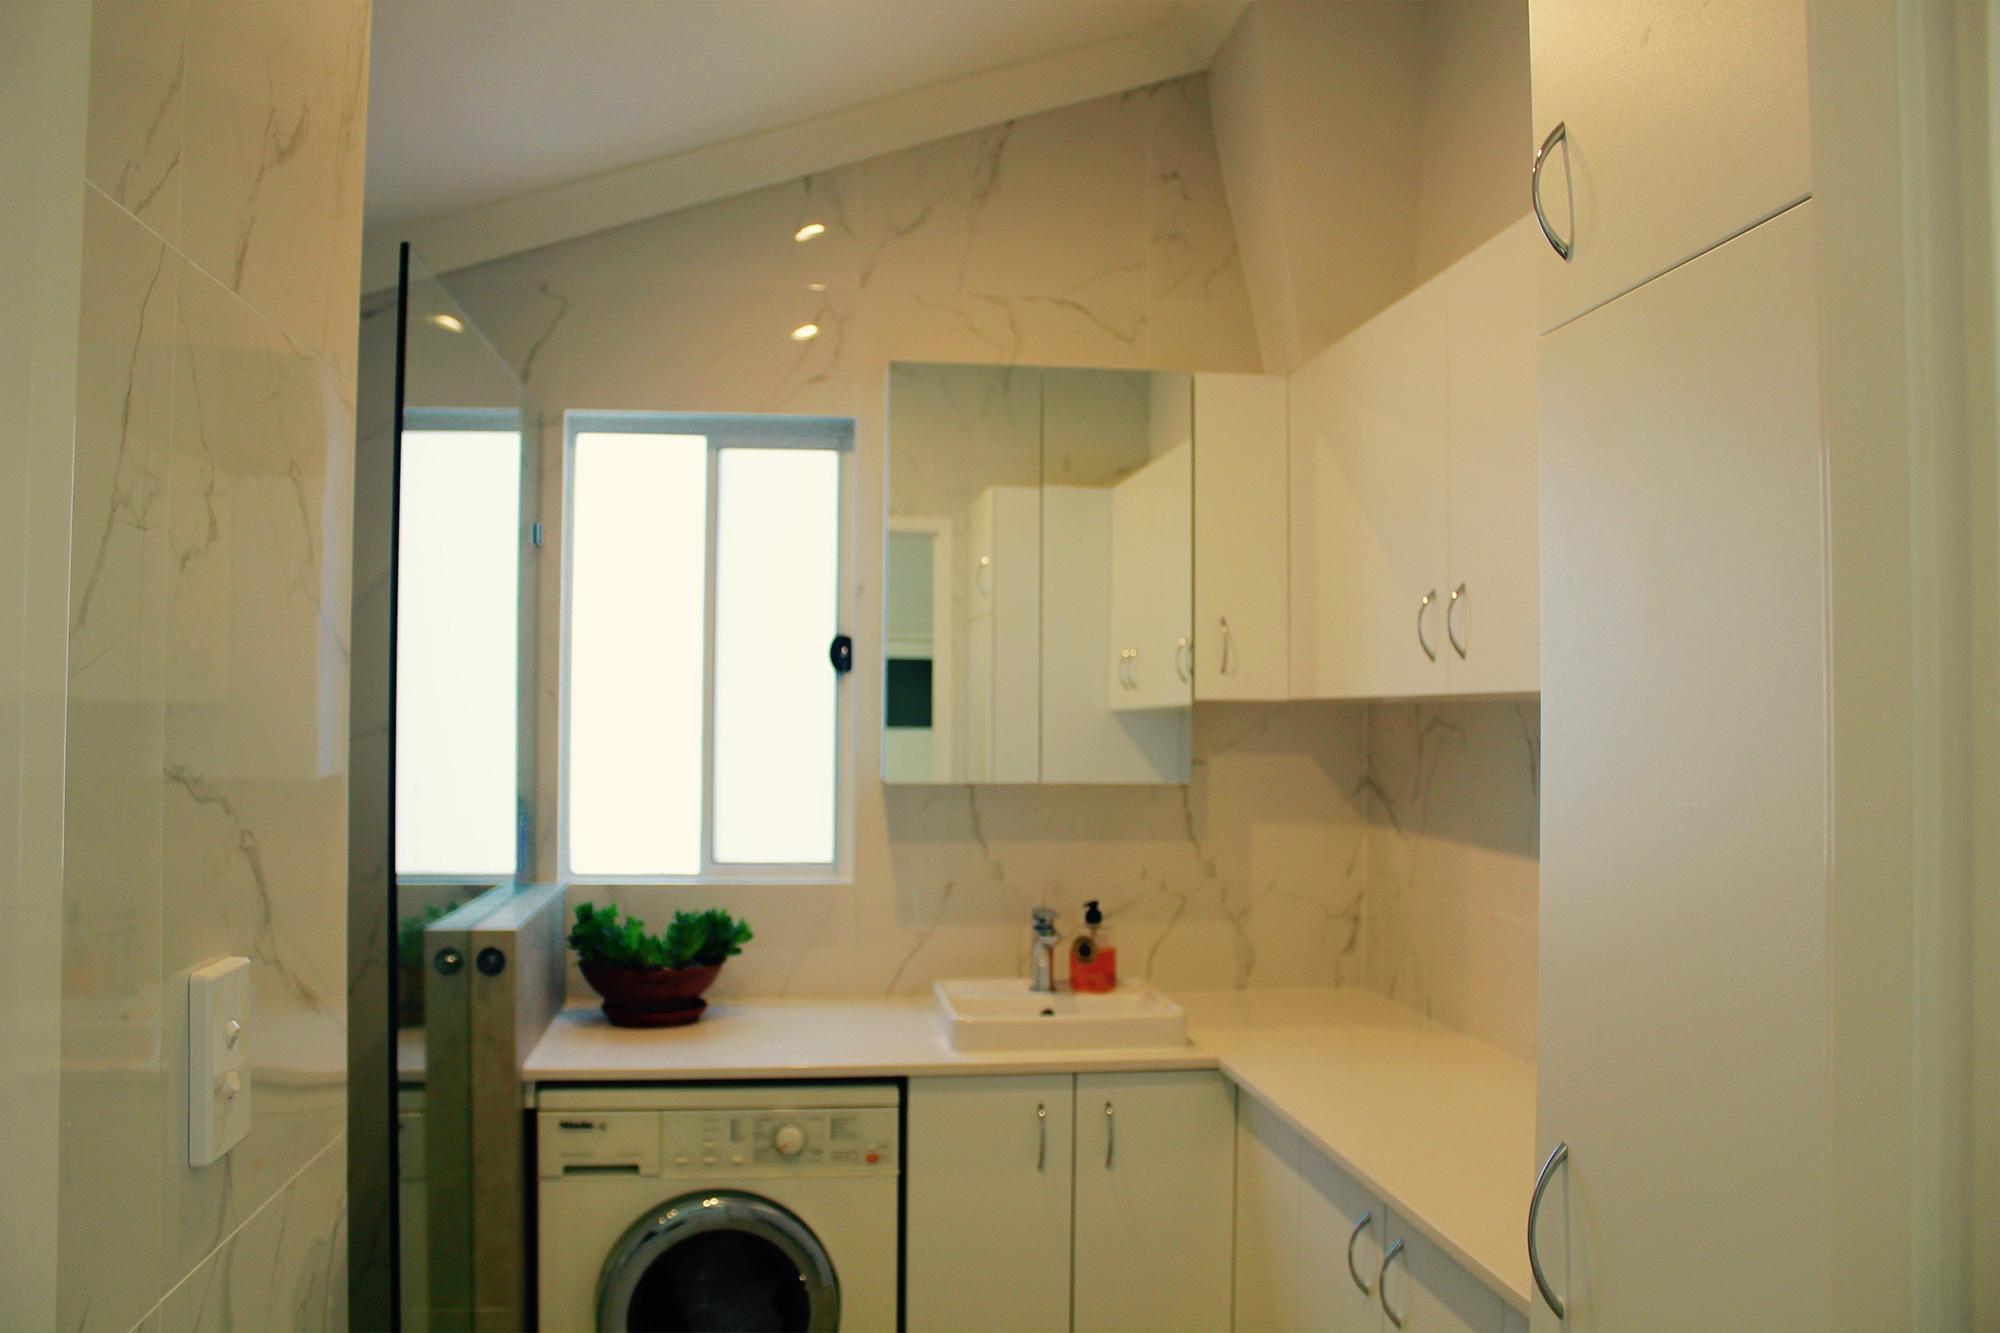 Trademark Tiling: Laundry Tiling